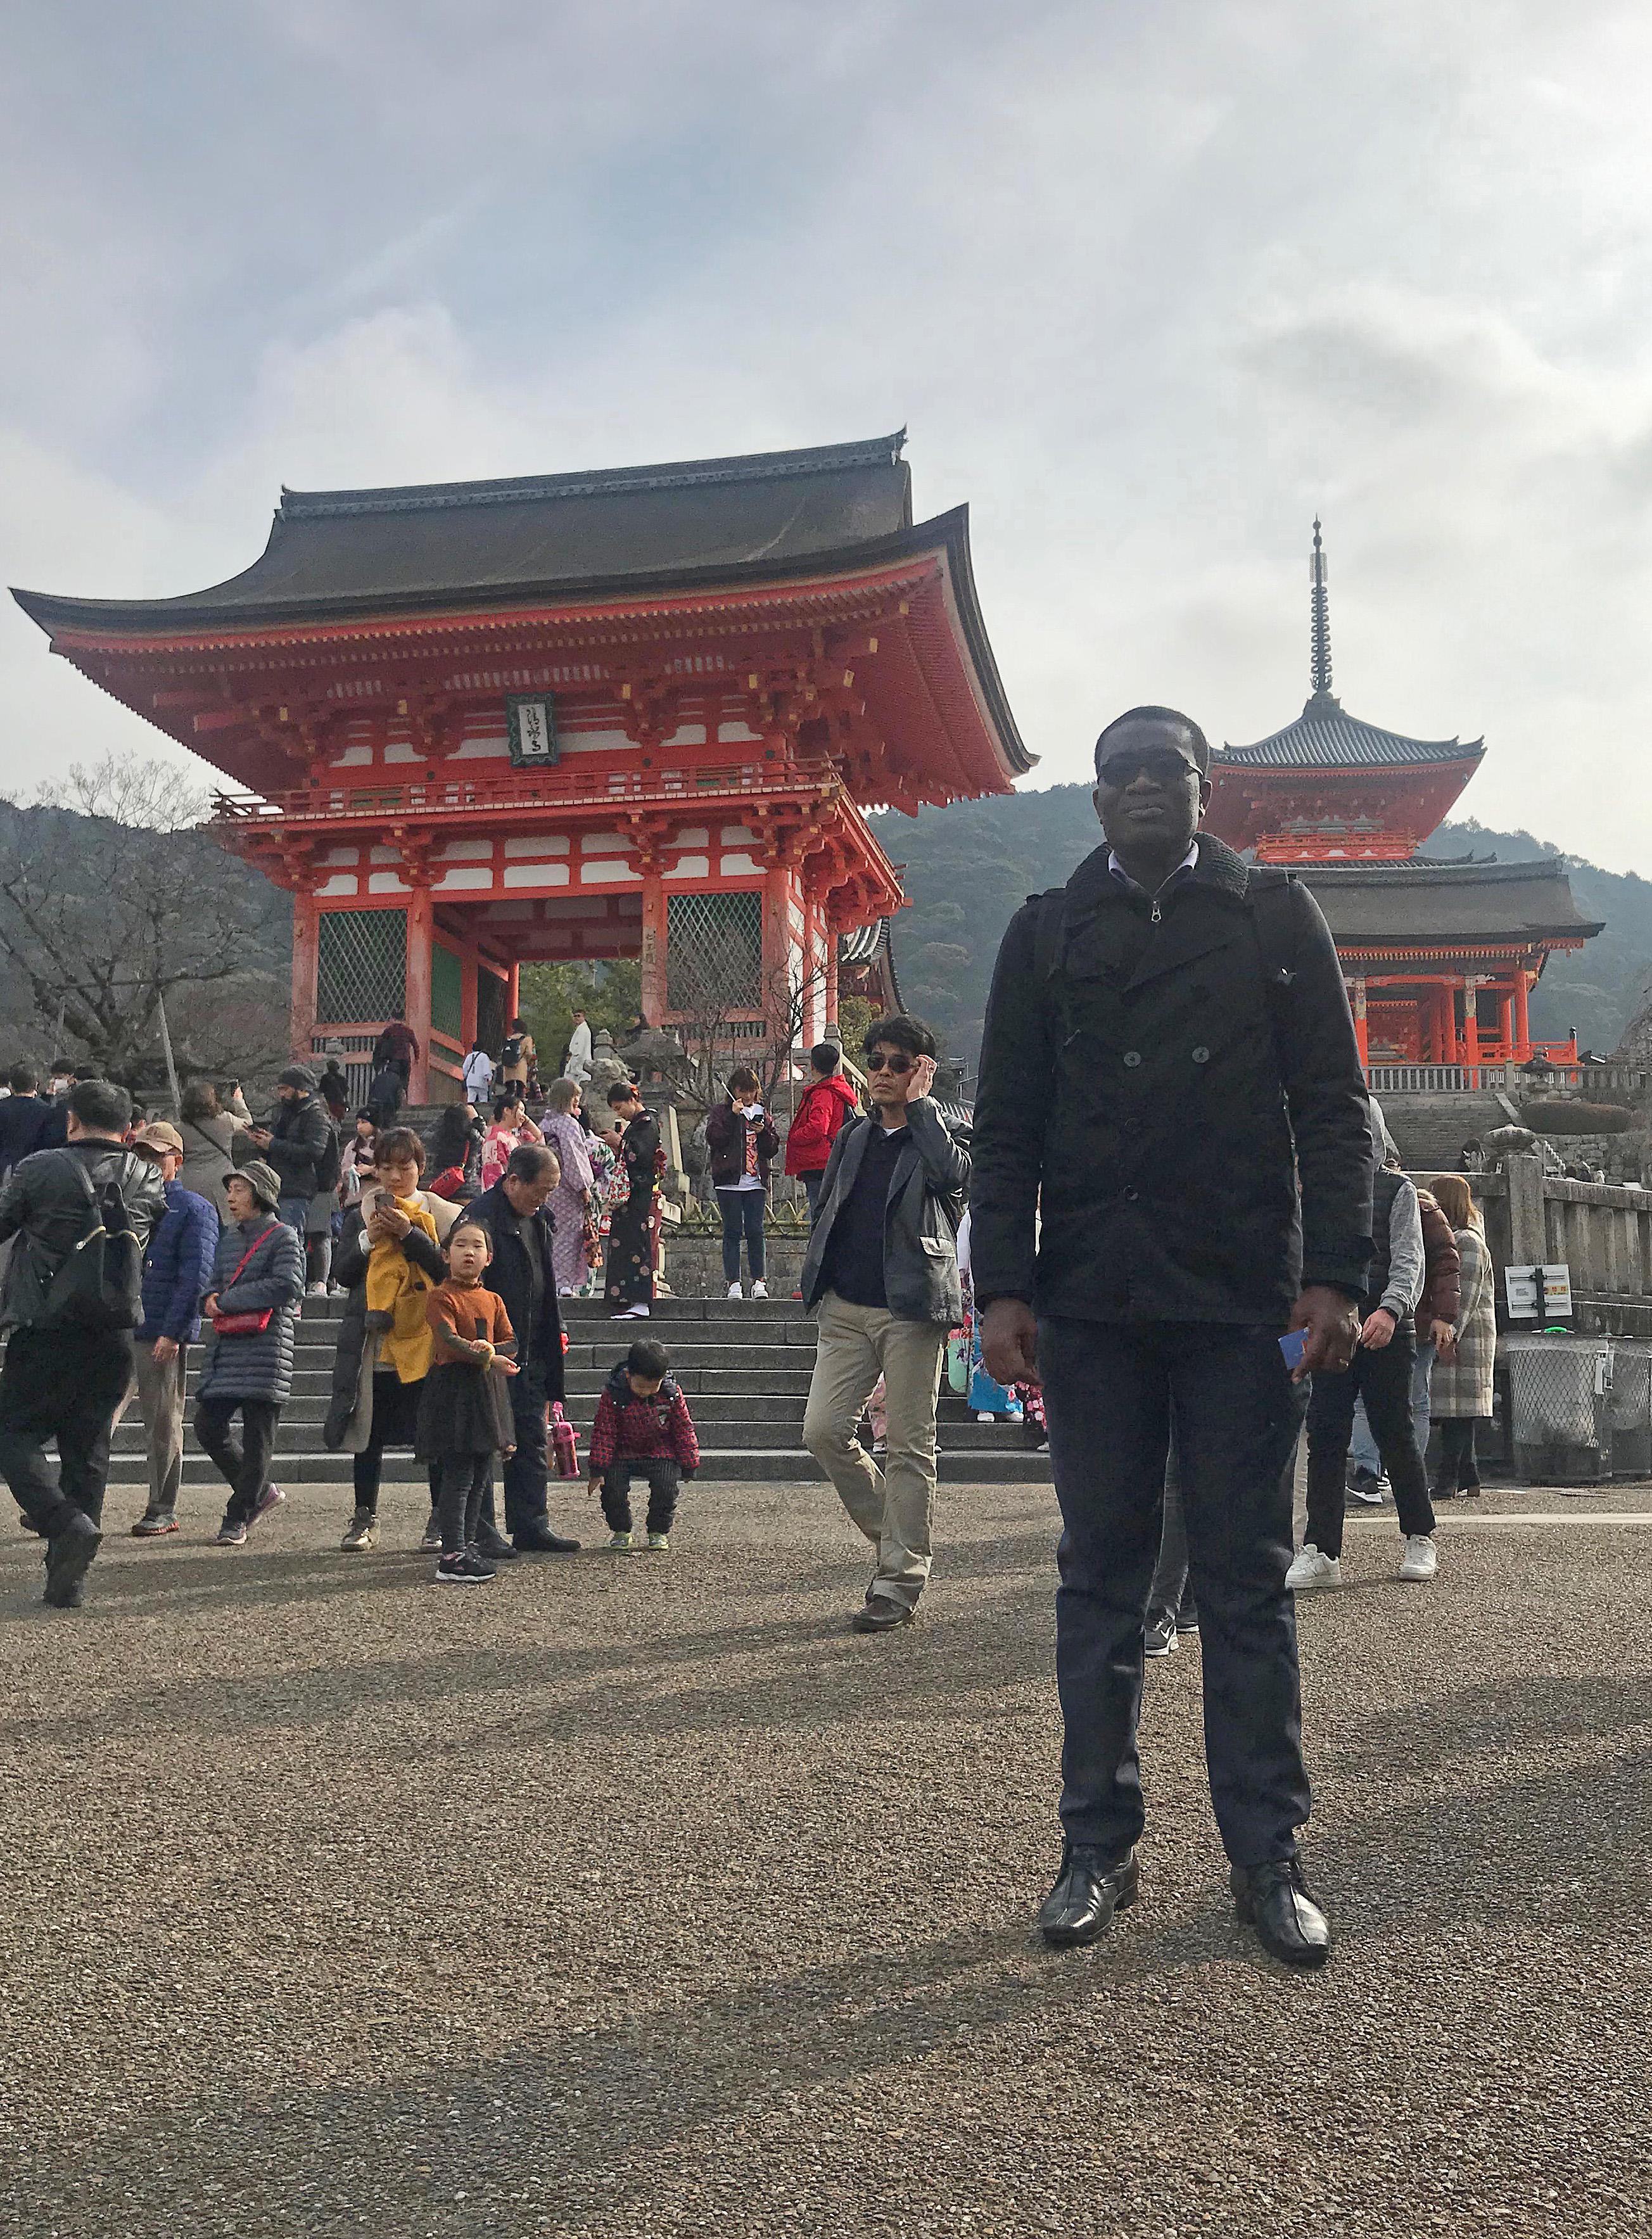 Amoah博士による日本滞在記